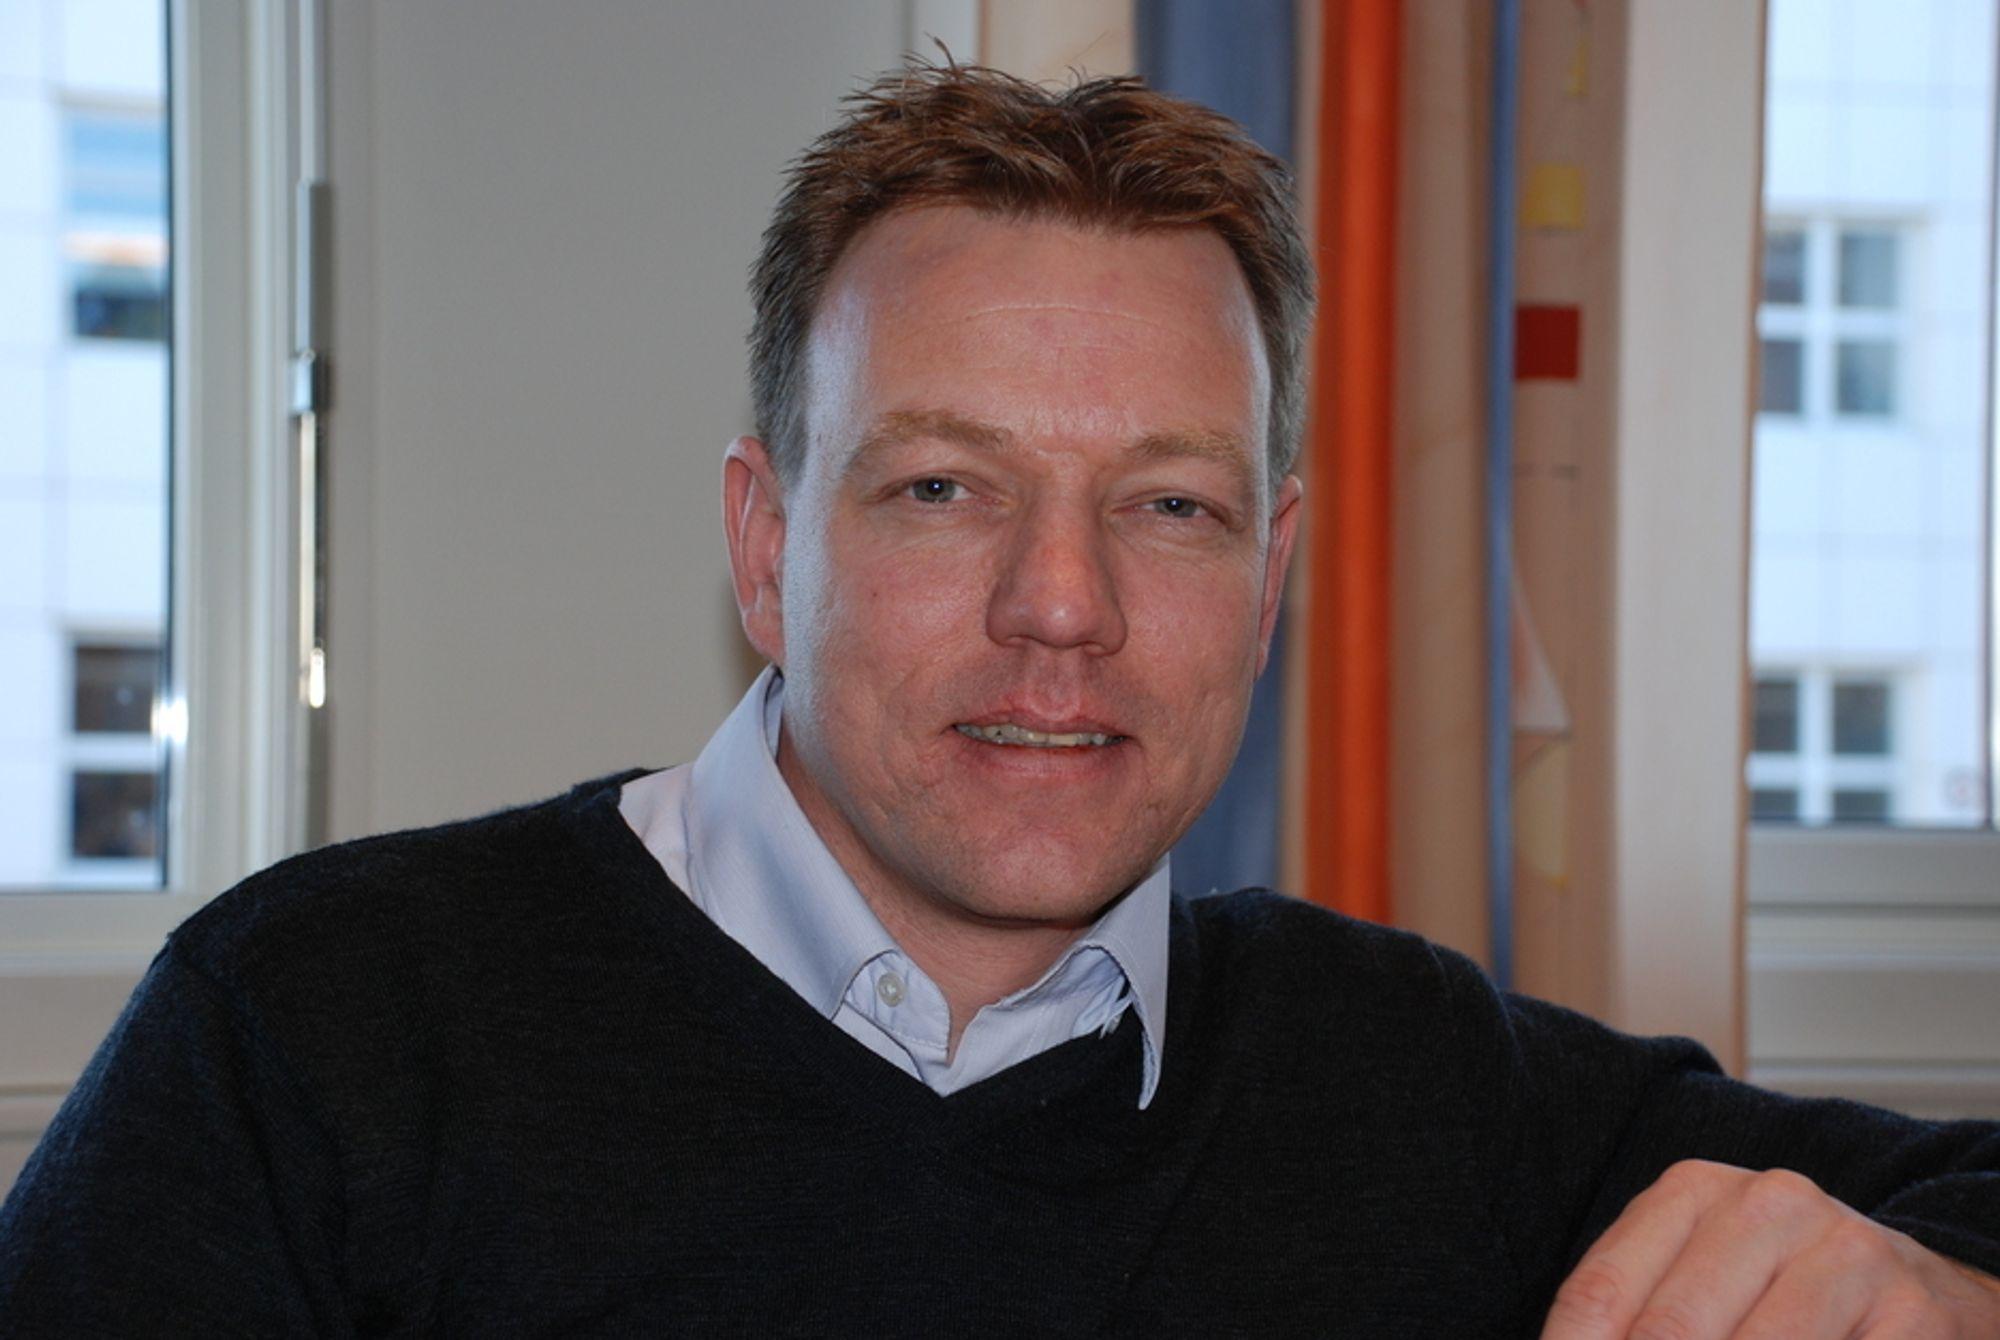 BILLIGERE: Svein Tore Moe, daglig leder i Cenika, utfordrer de store leverandørene.